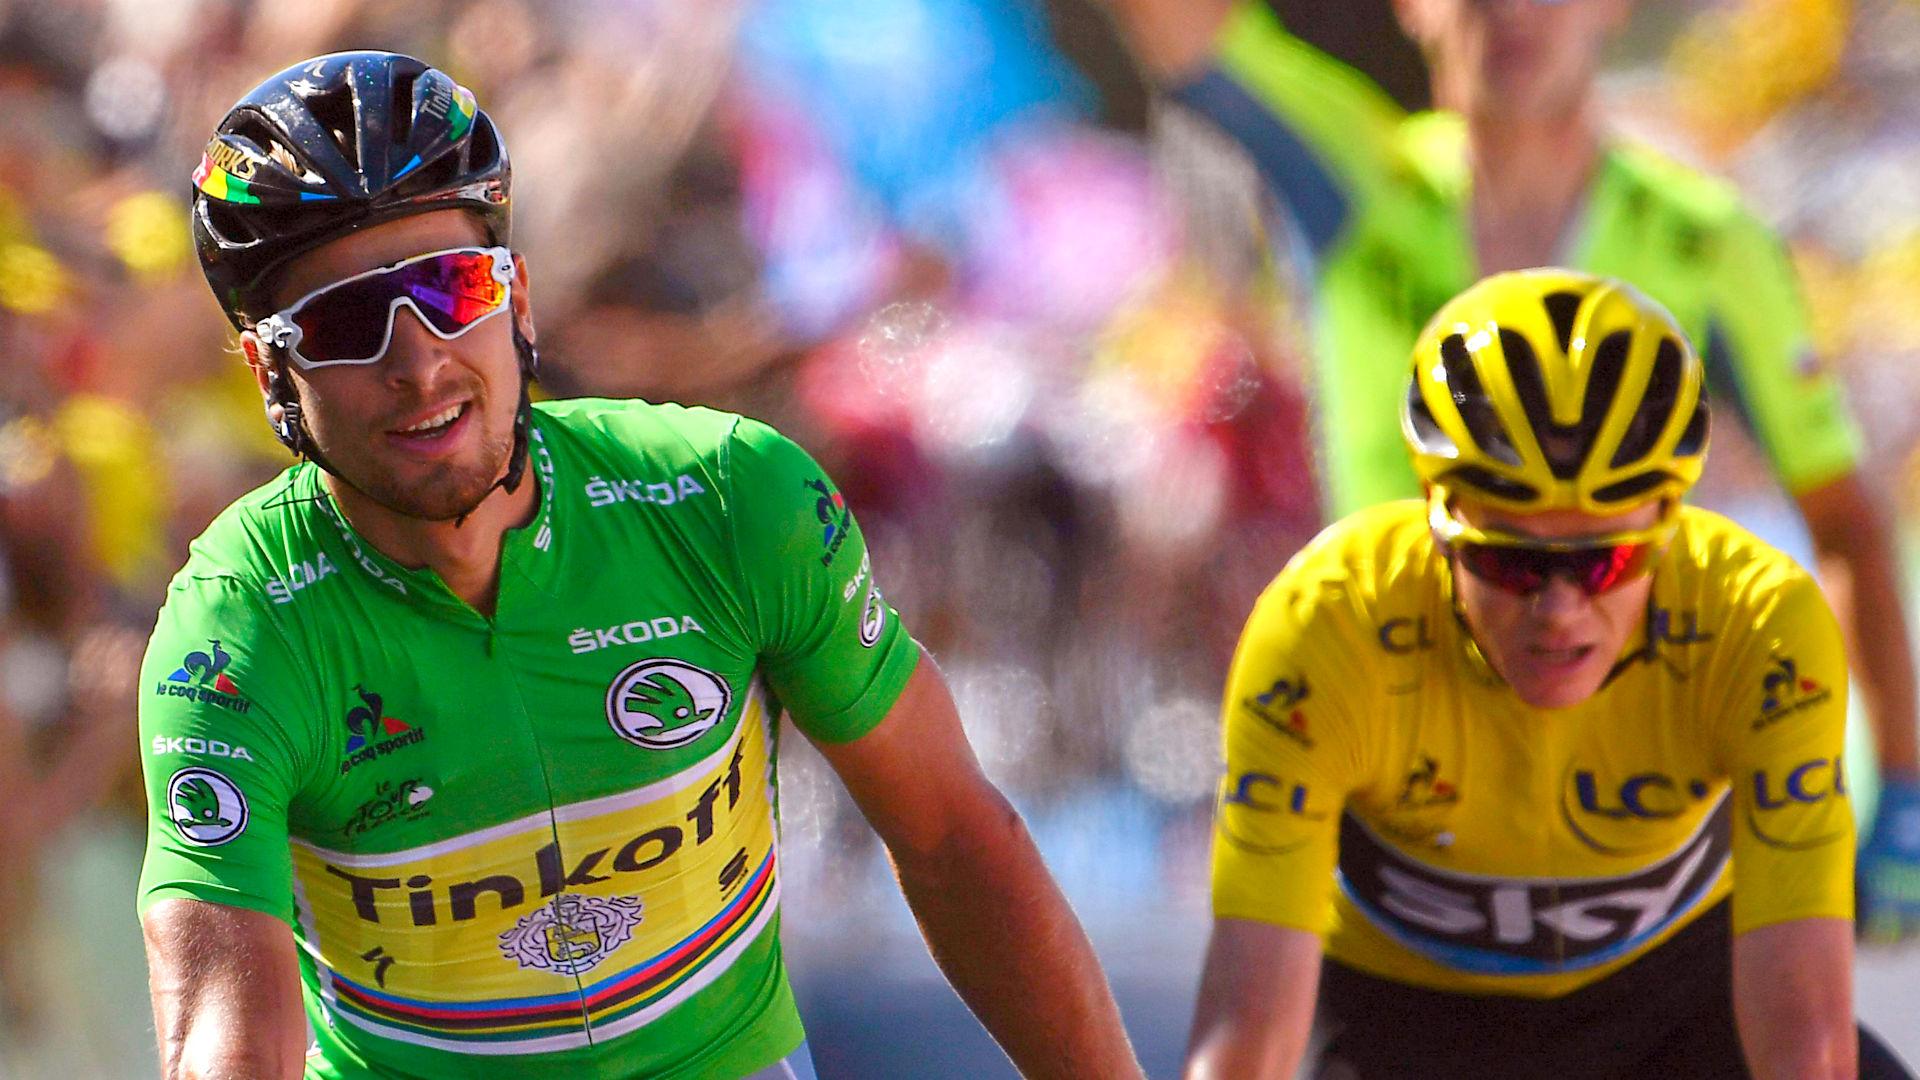 Peter Sagan Stage 3 Tour De France 2018 1358117 Hd